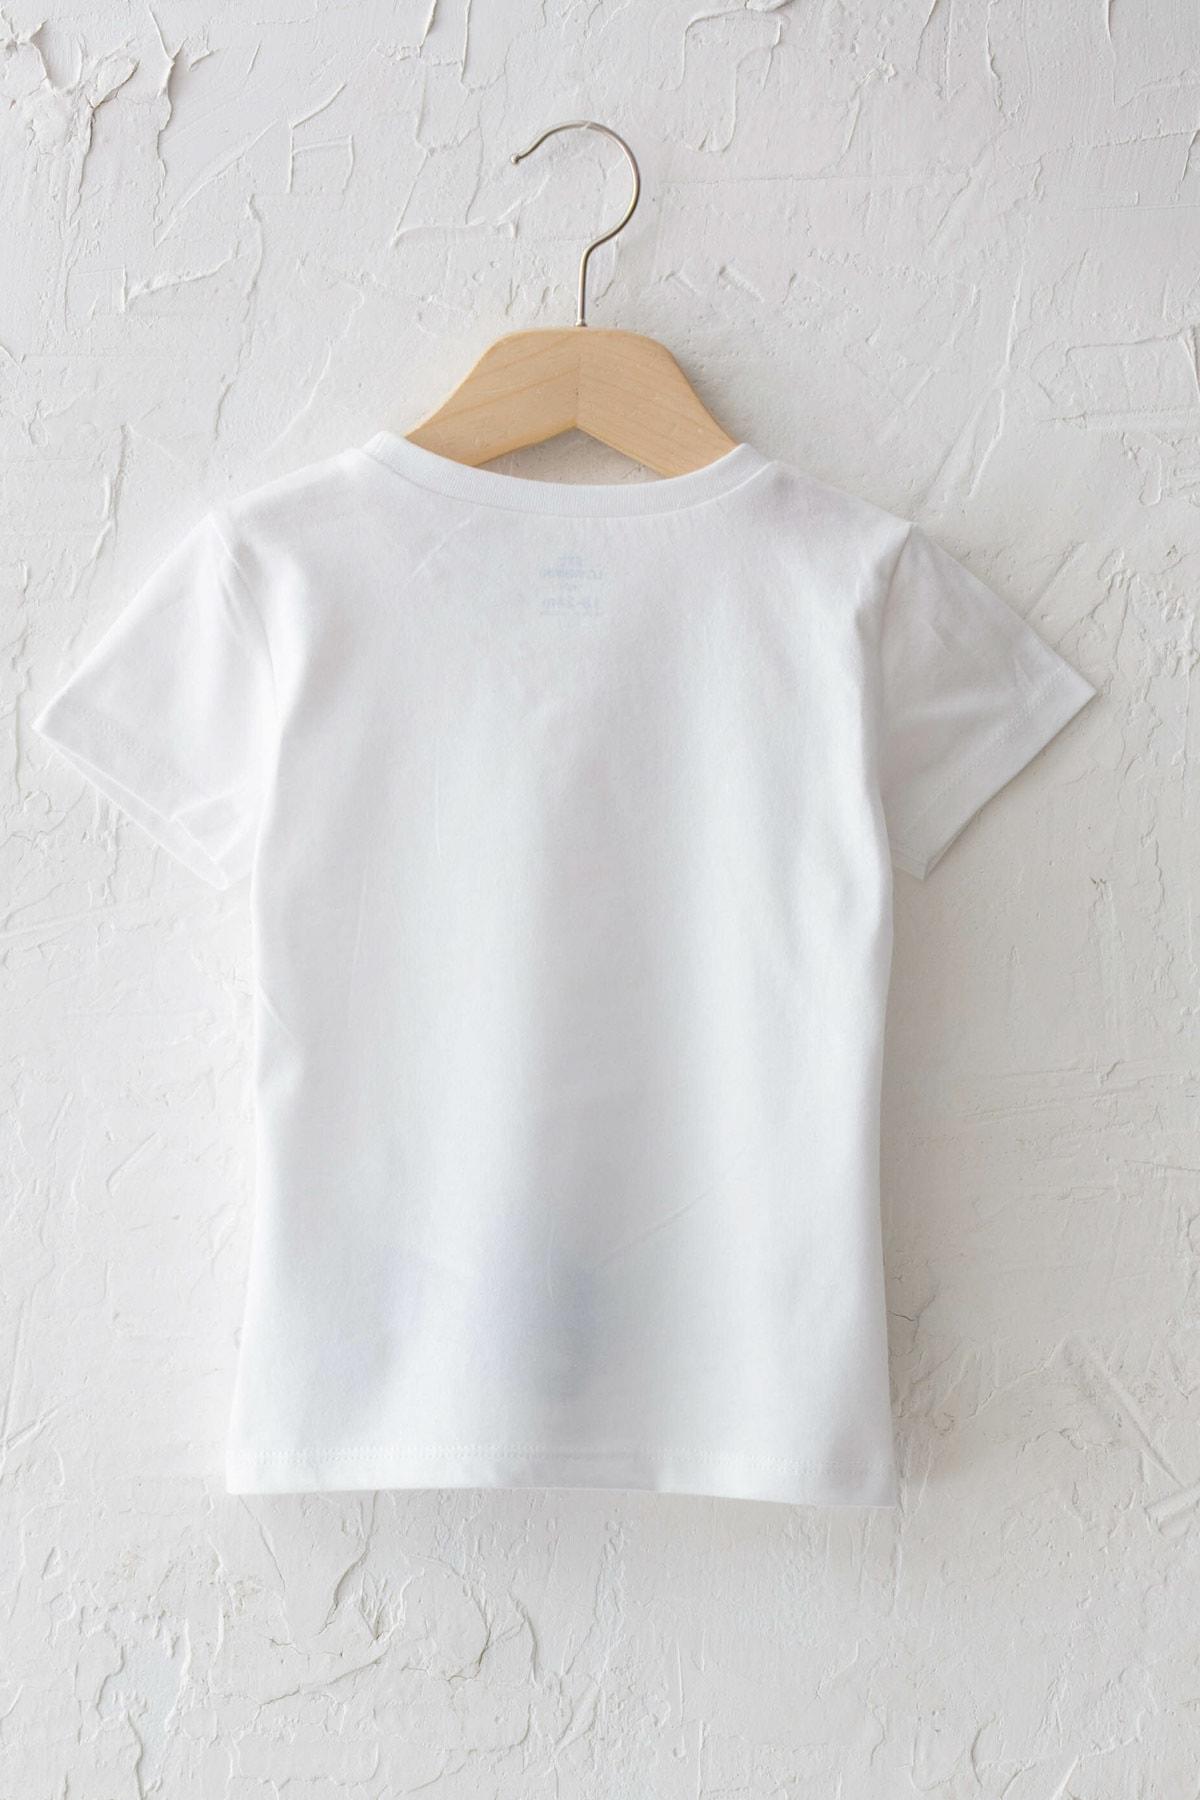 LC Waikiki Erkek Bebek Optik Beyaz E5X T-Shirt 2